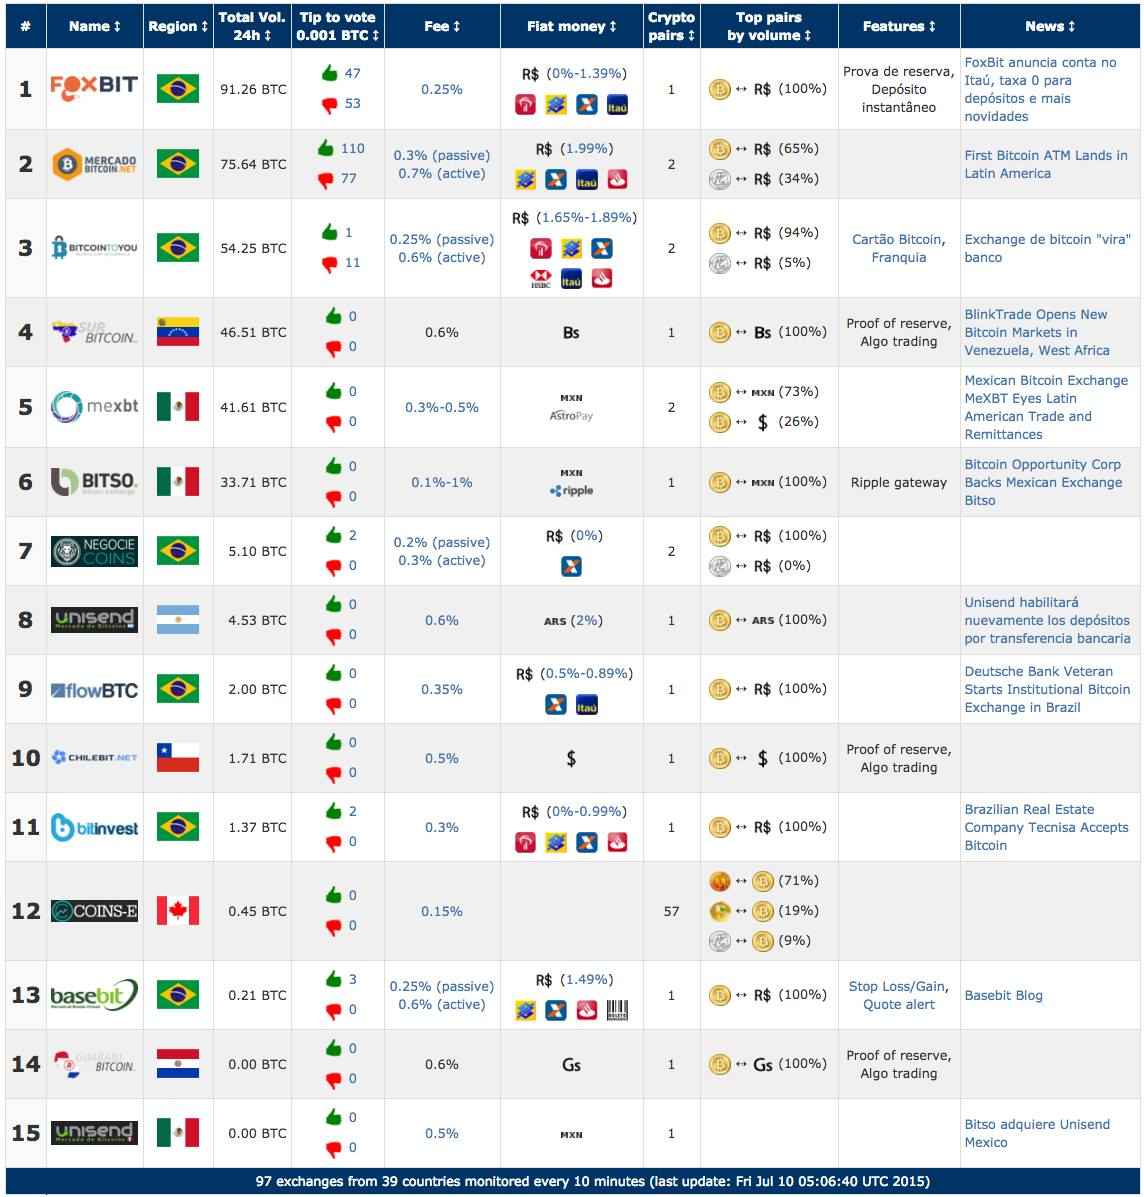 bitcoin america latina